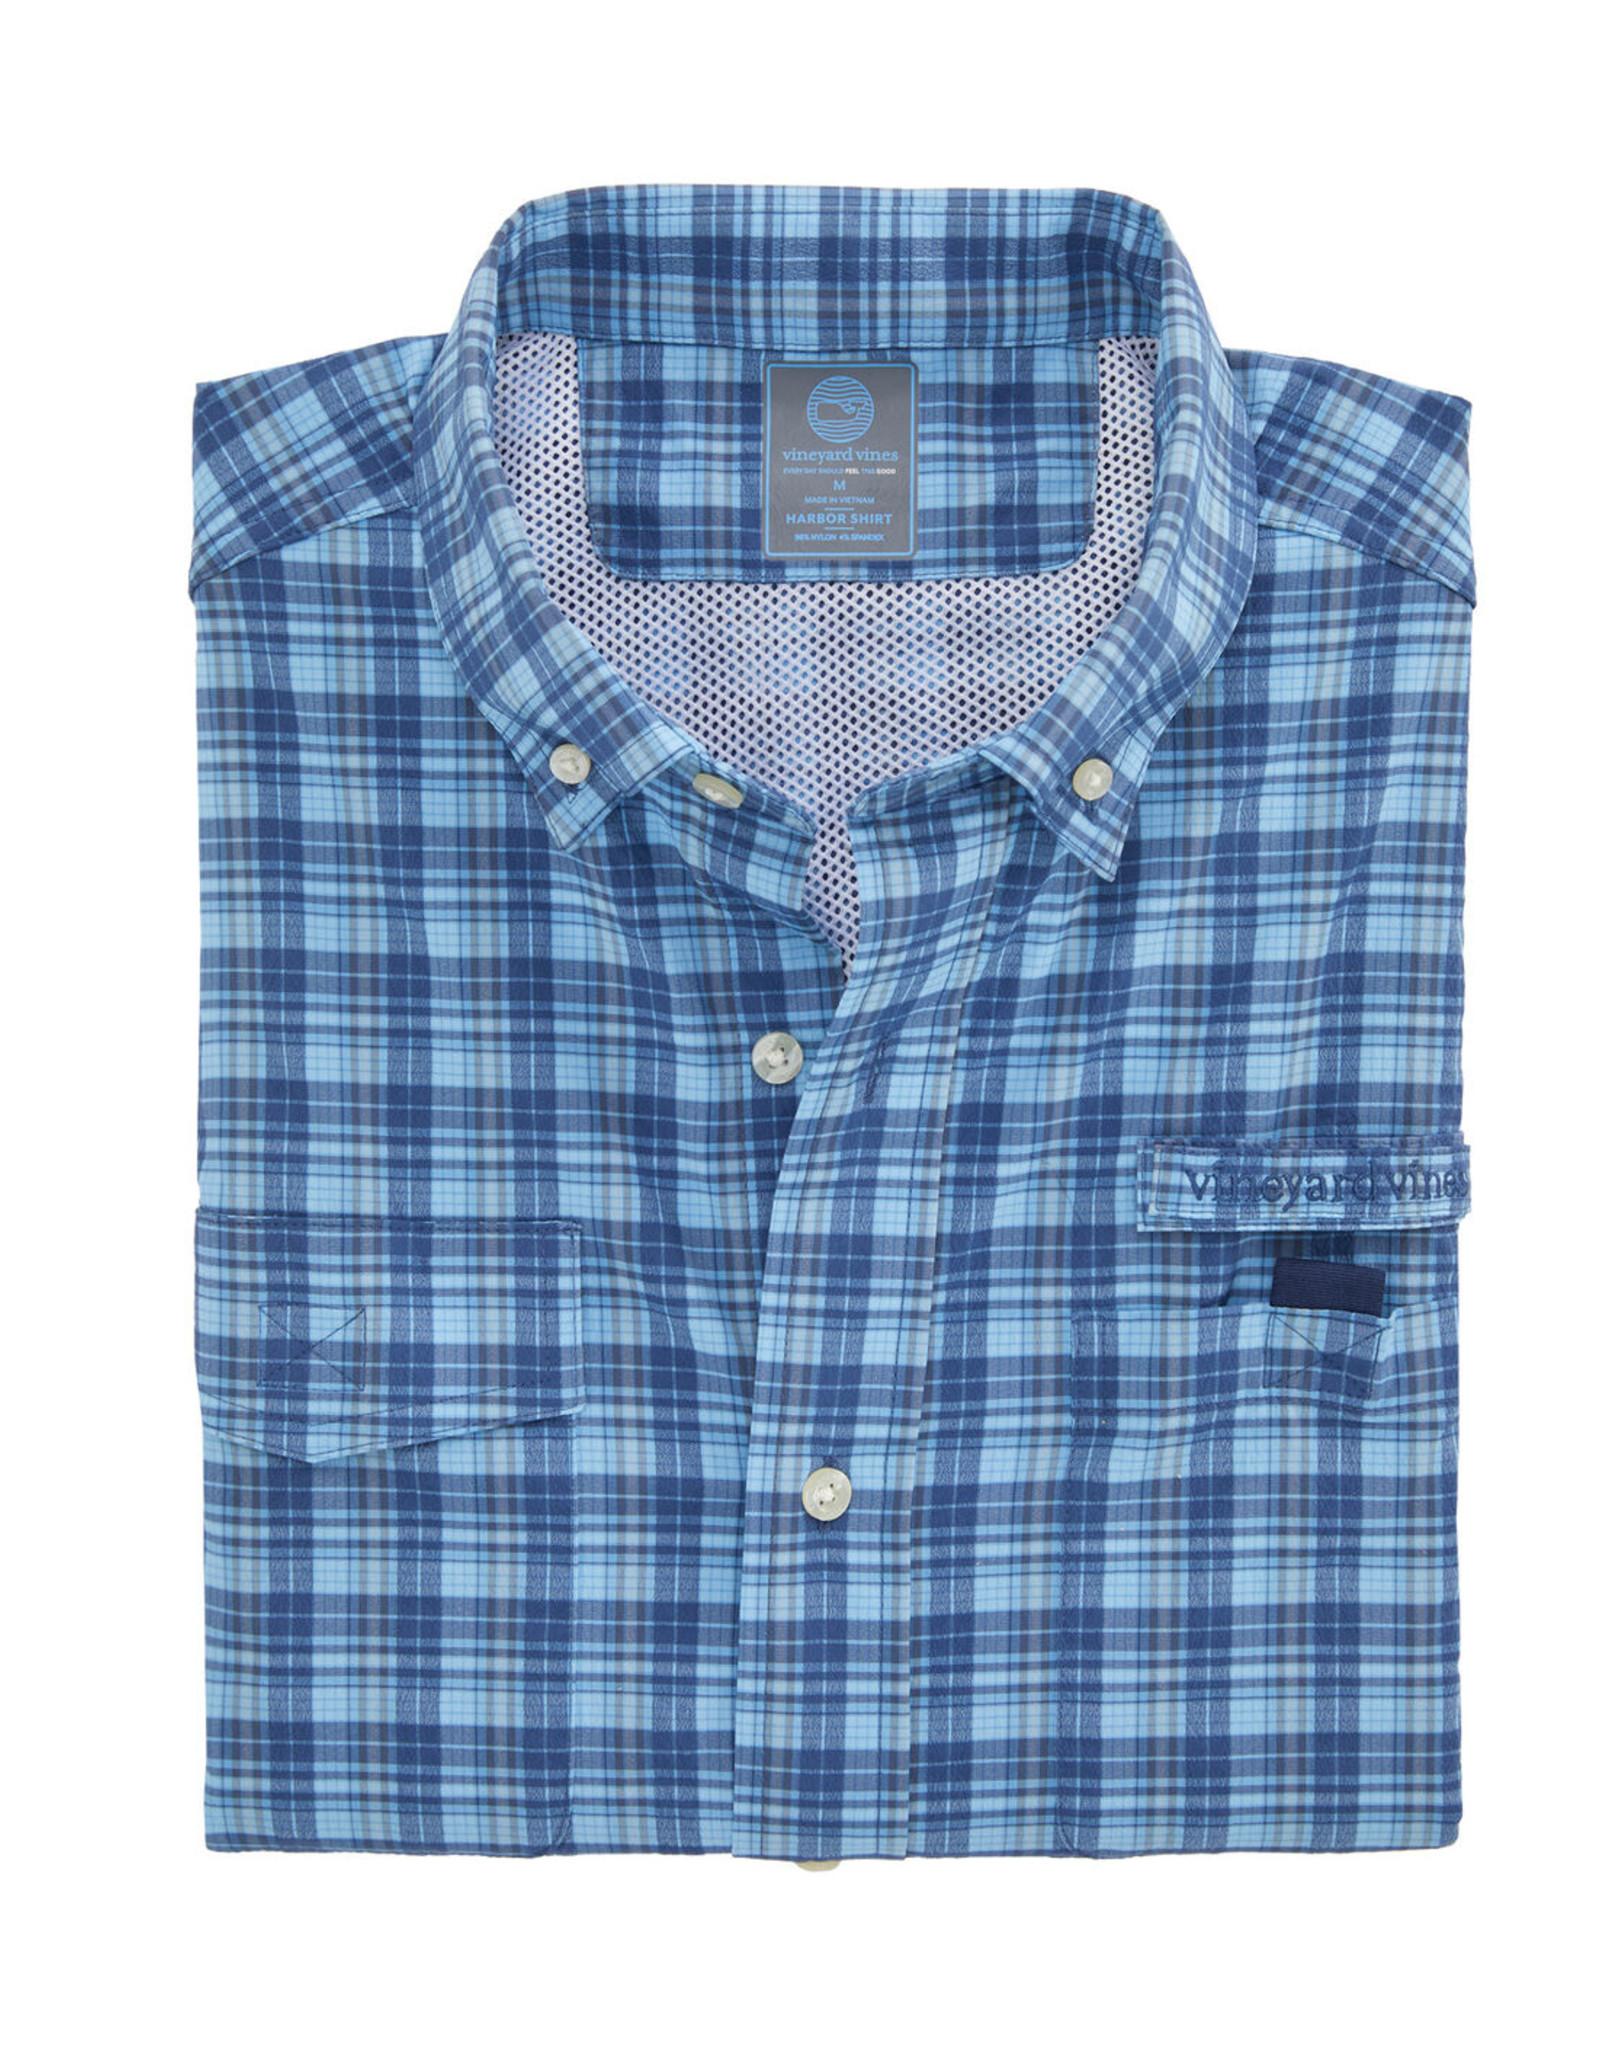 Vineyard Vines Emerald Harbor Shirt